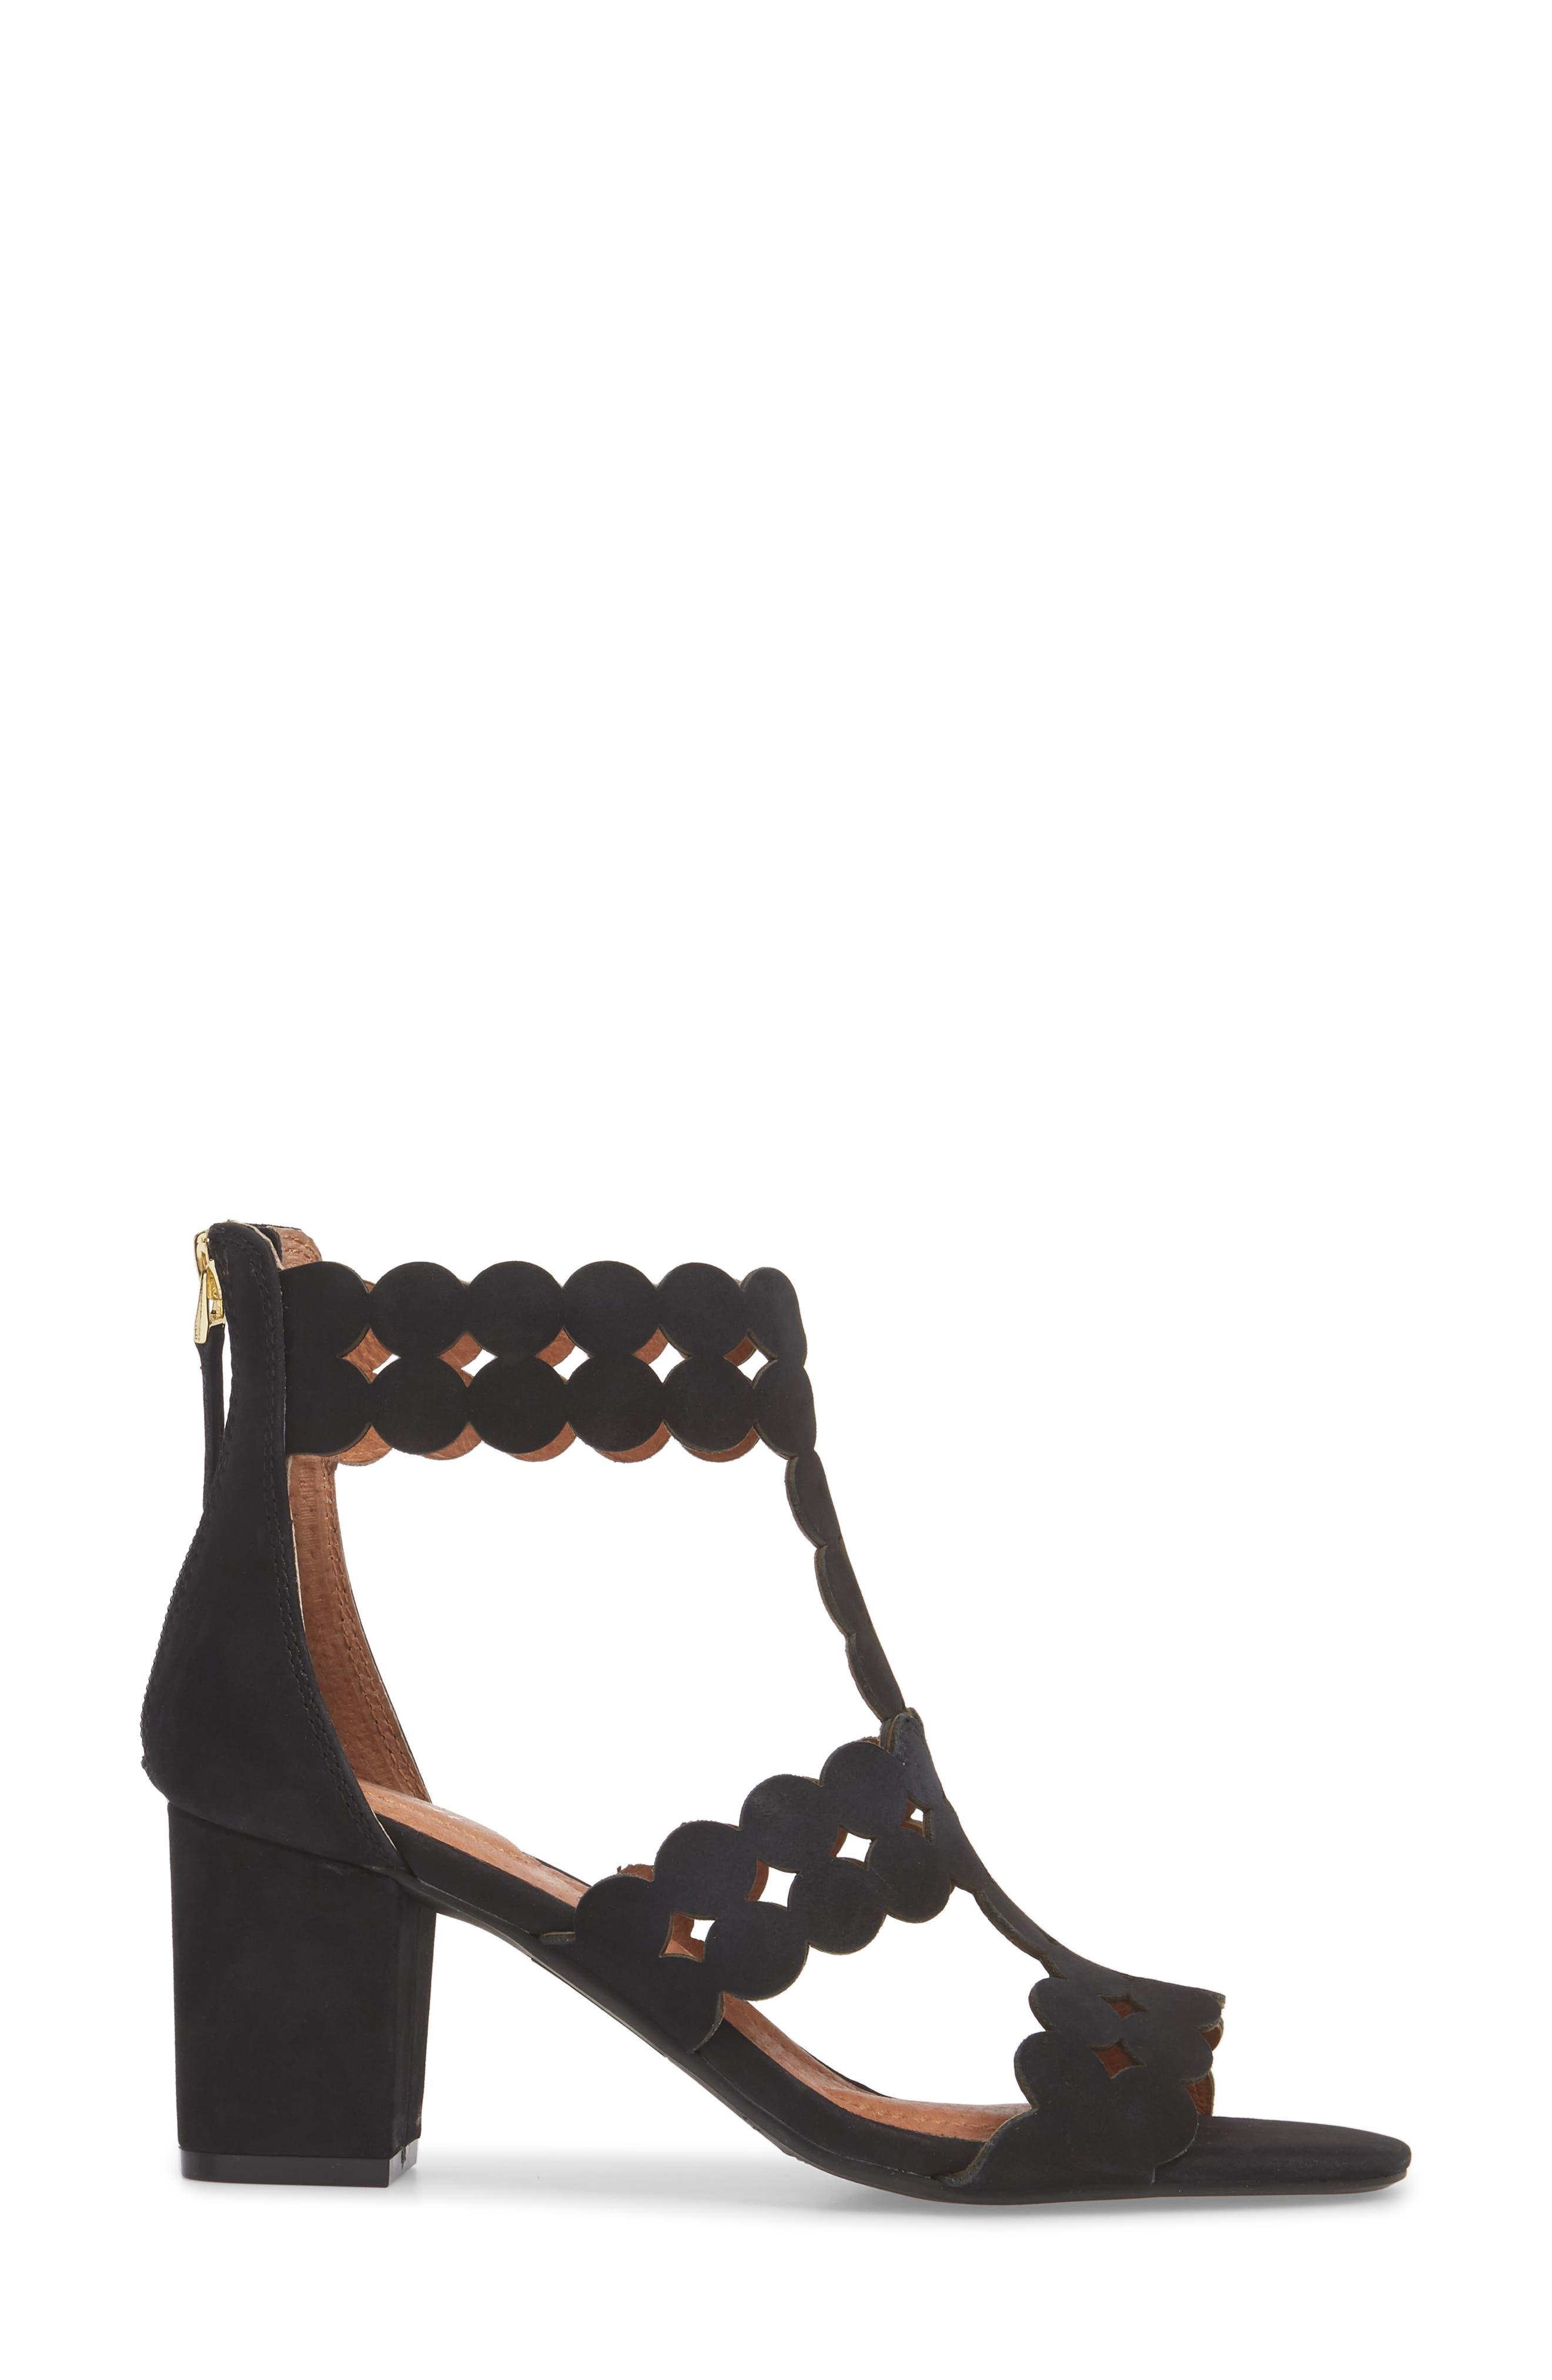 SUDINI,                             Novara Block Heel Sandal,                             Alternate thumbnail 3, color,                             BLACK NUBUCK LEATHER